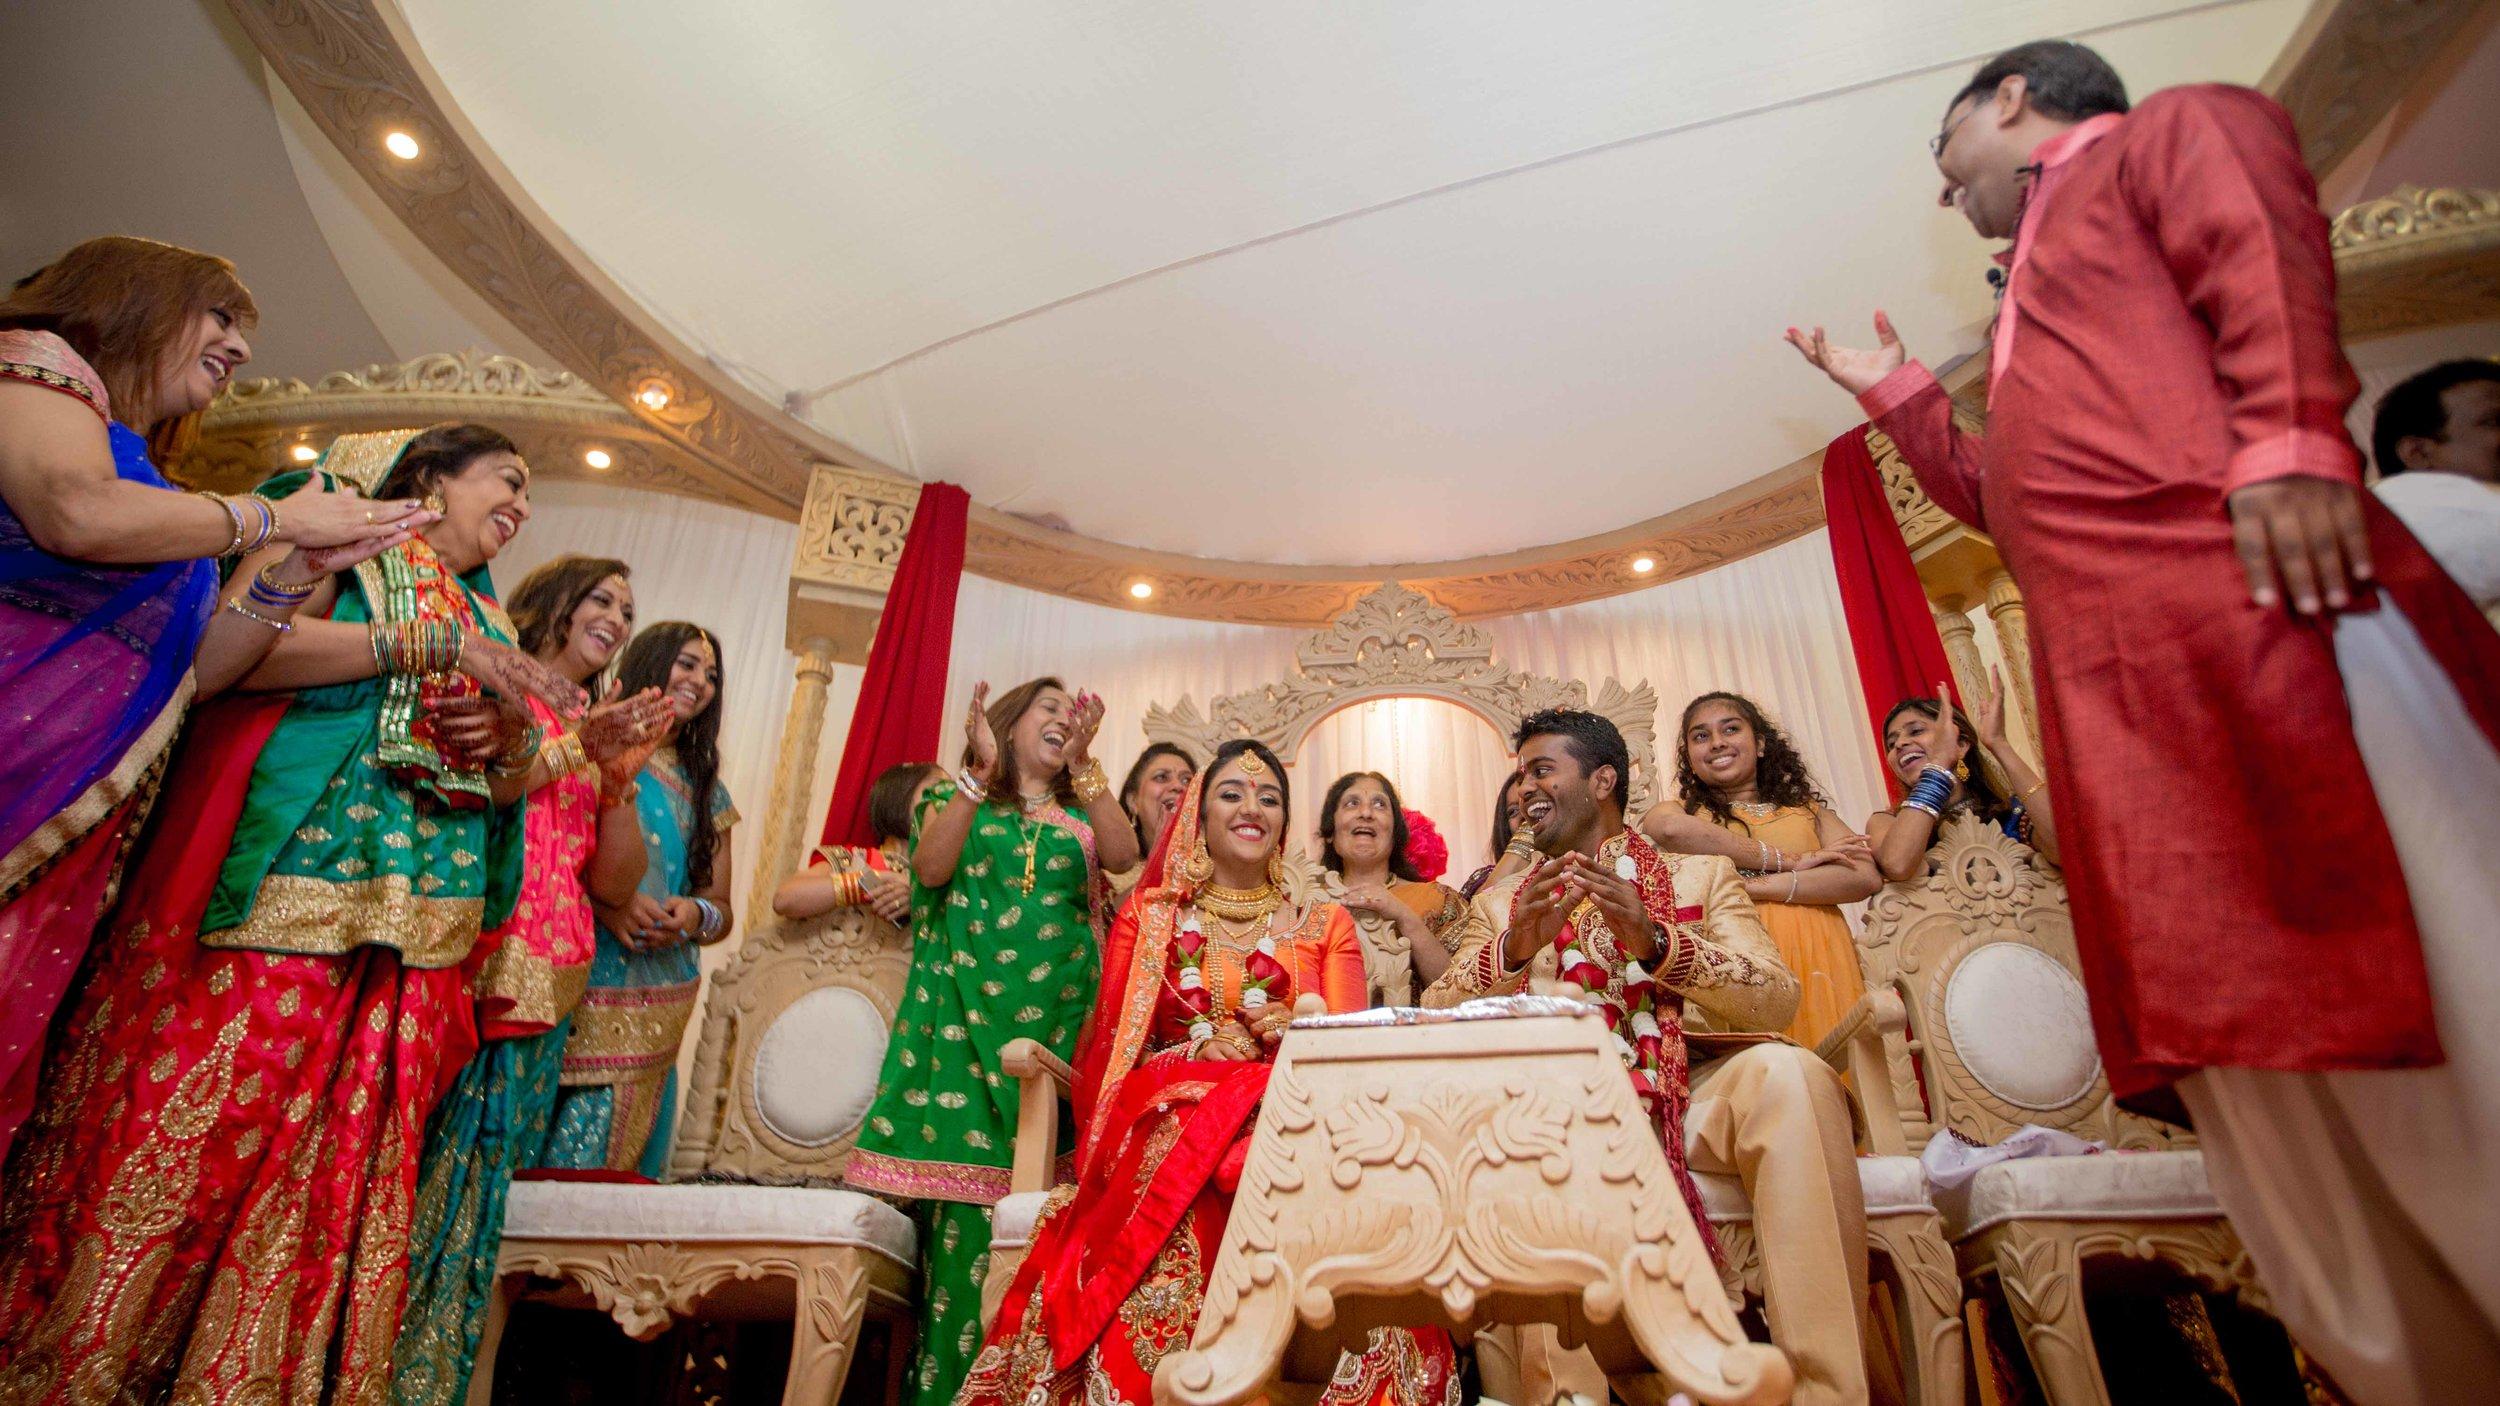 premier-banquetting-london-Hindu-asian-wedding-photographer-natalia-smith-photography-29.jpg